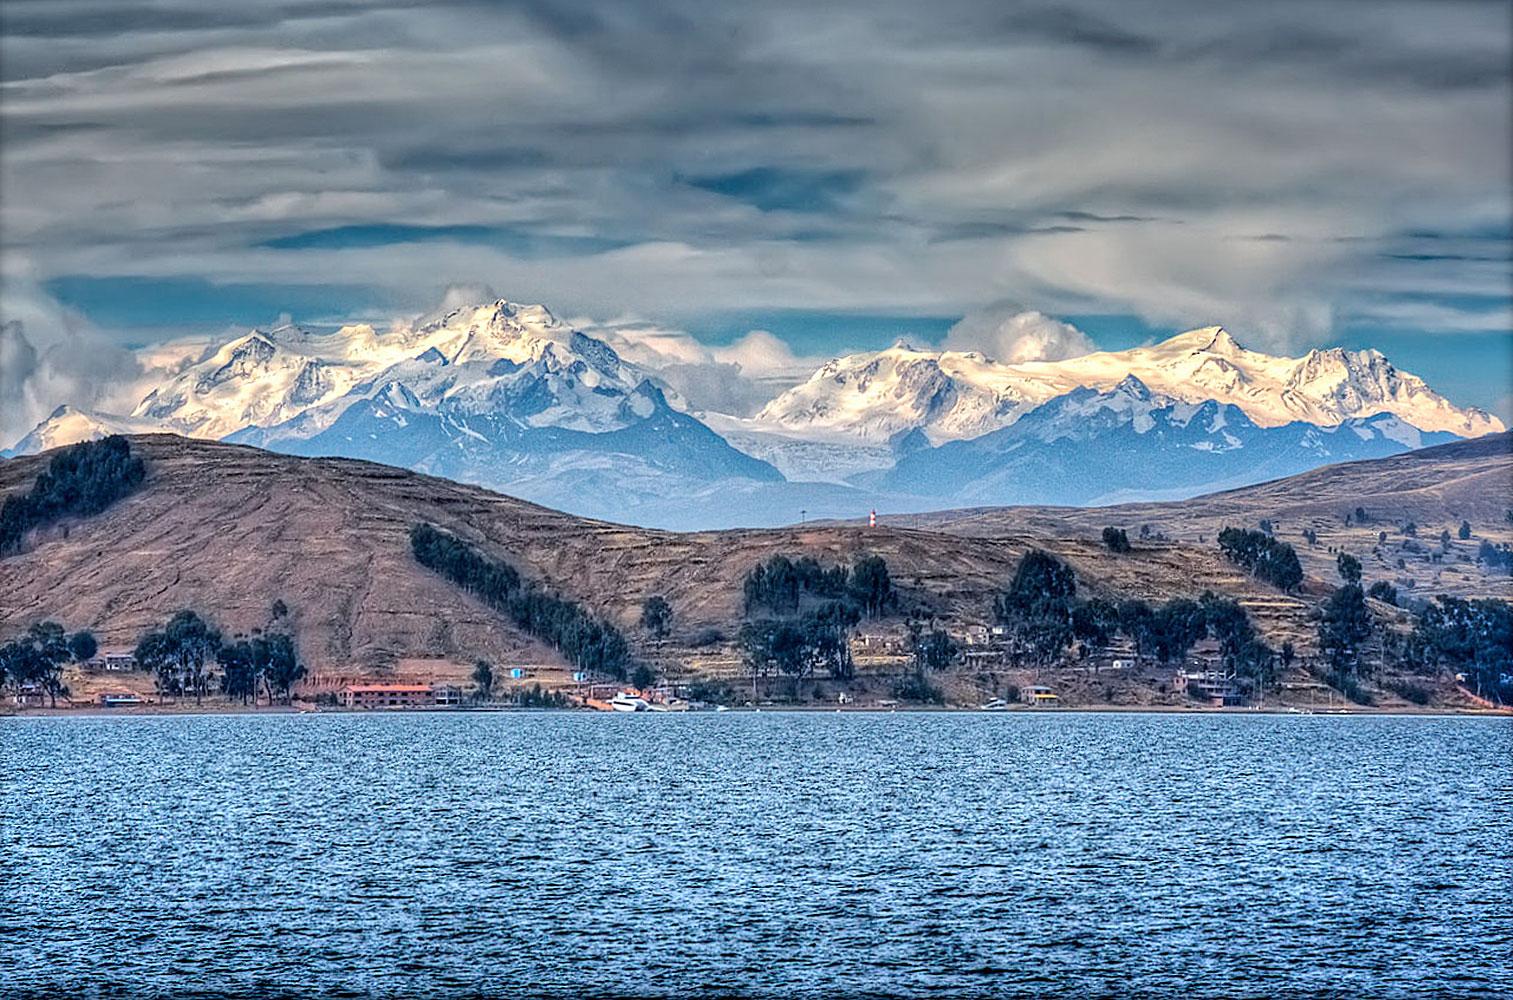 Сдвиг полюсов. Озеро Титикака